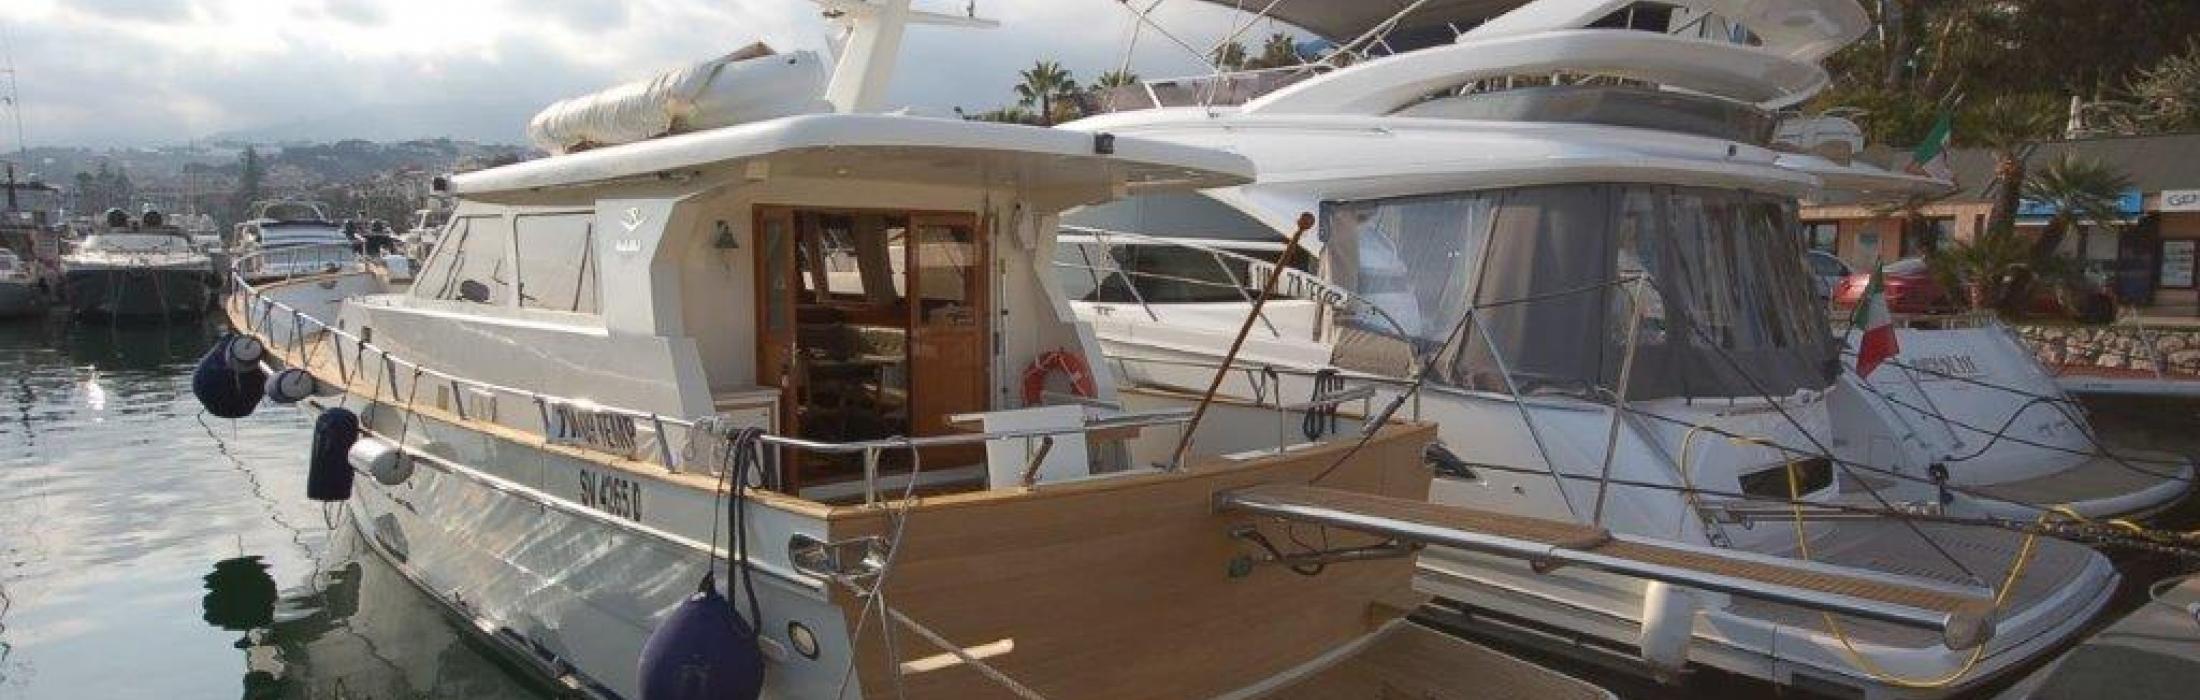 Riviera Yacht Alaska 17